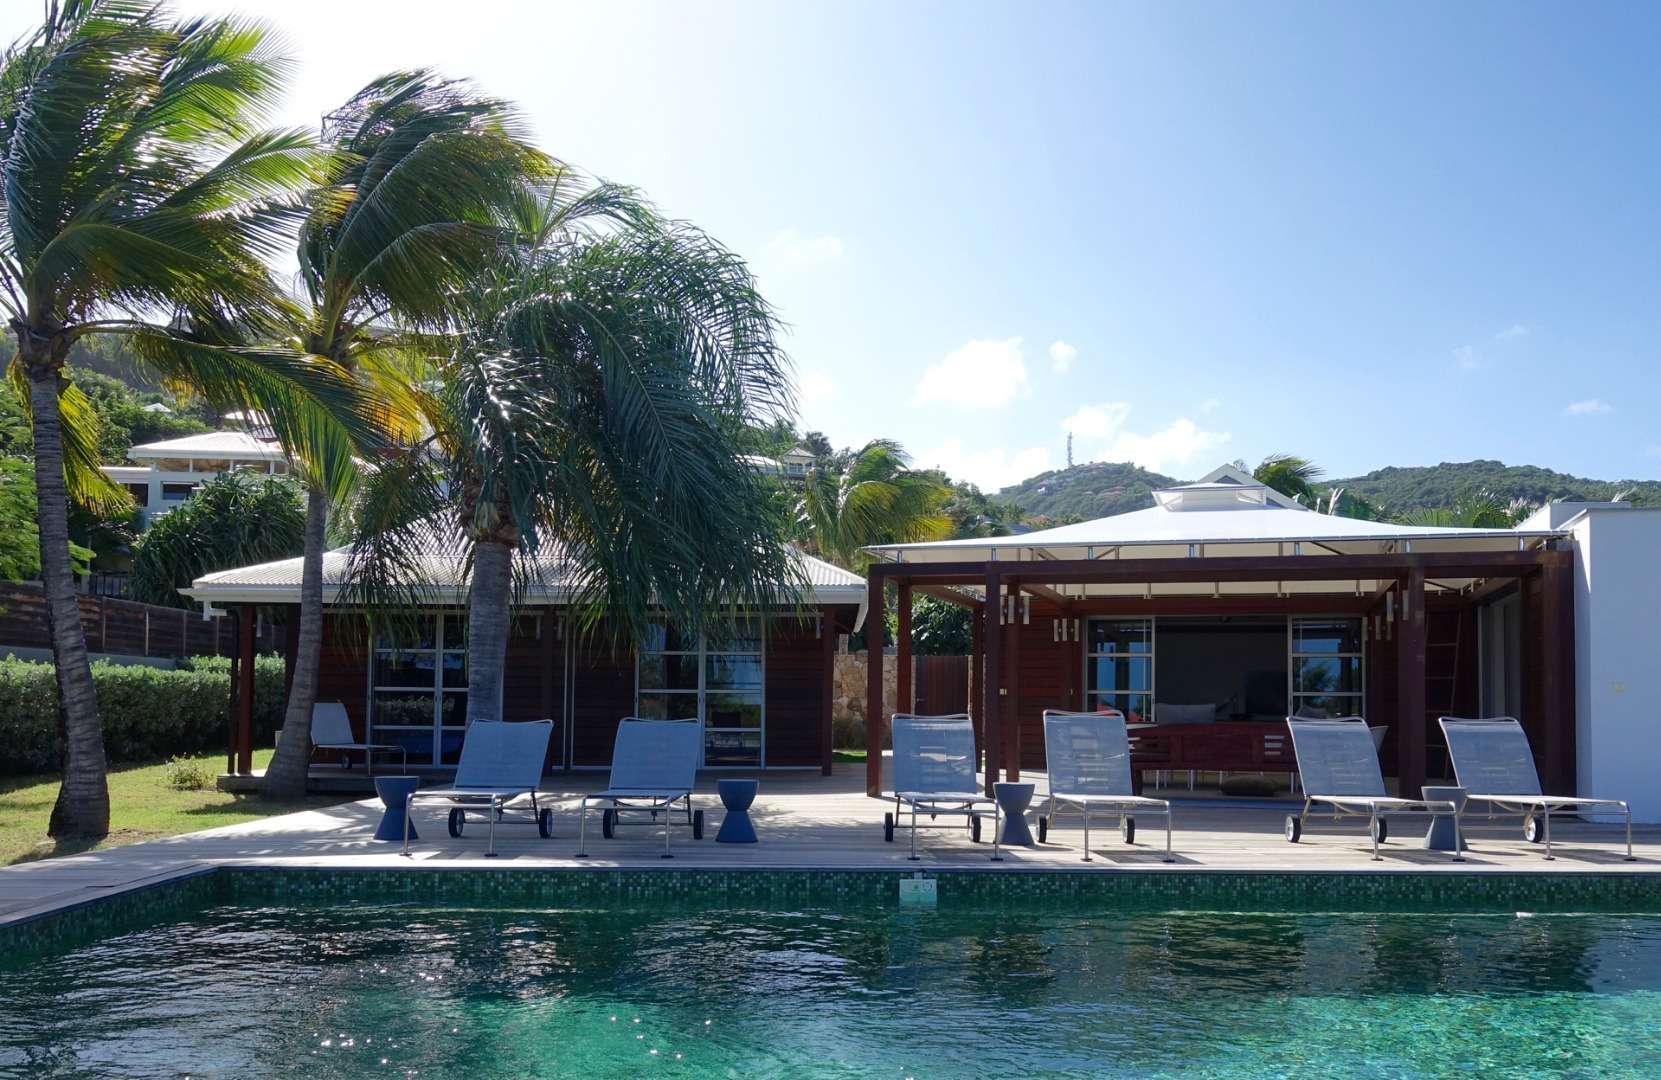 Luxury villa rentals caribbean - St barthelemy - Saint jean - No location 4 - Mak - Image 1/31